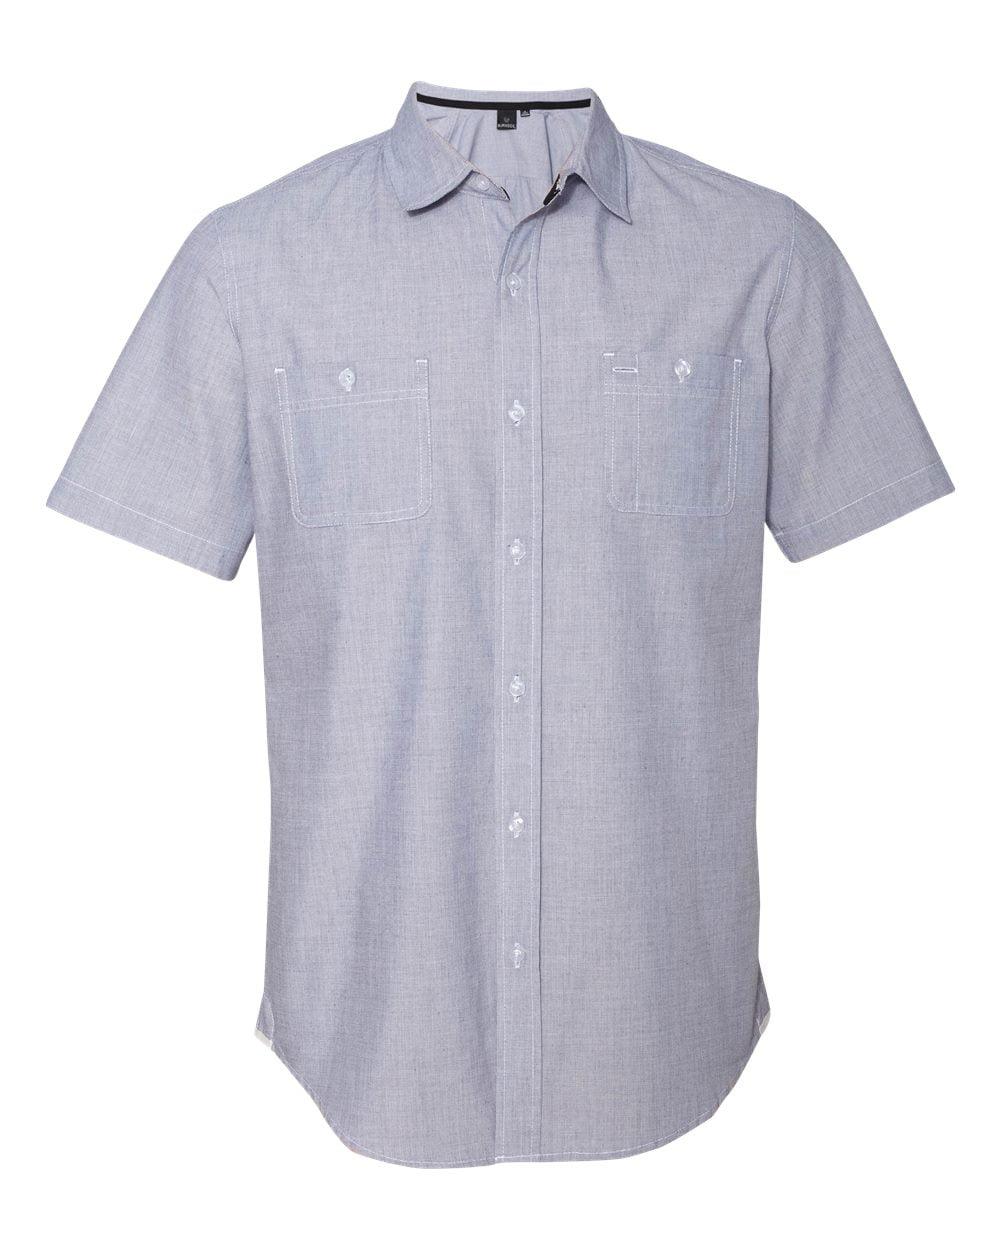 Burnside Mens Mini-Check Short Sleeve Shirt 9257 S-3XL Closeout